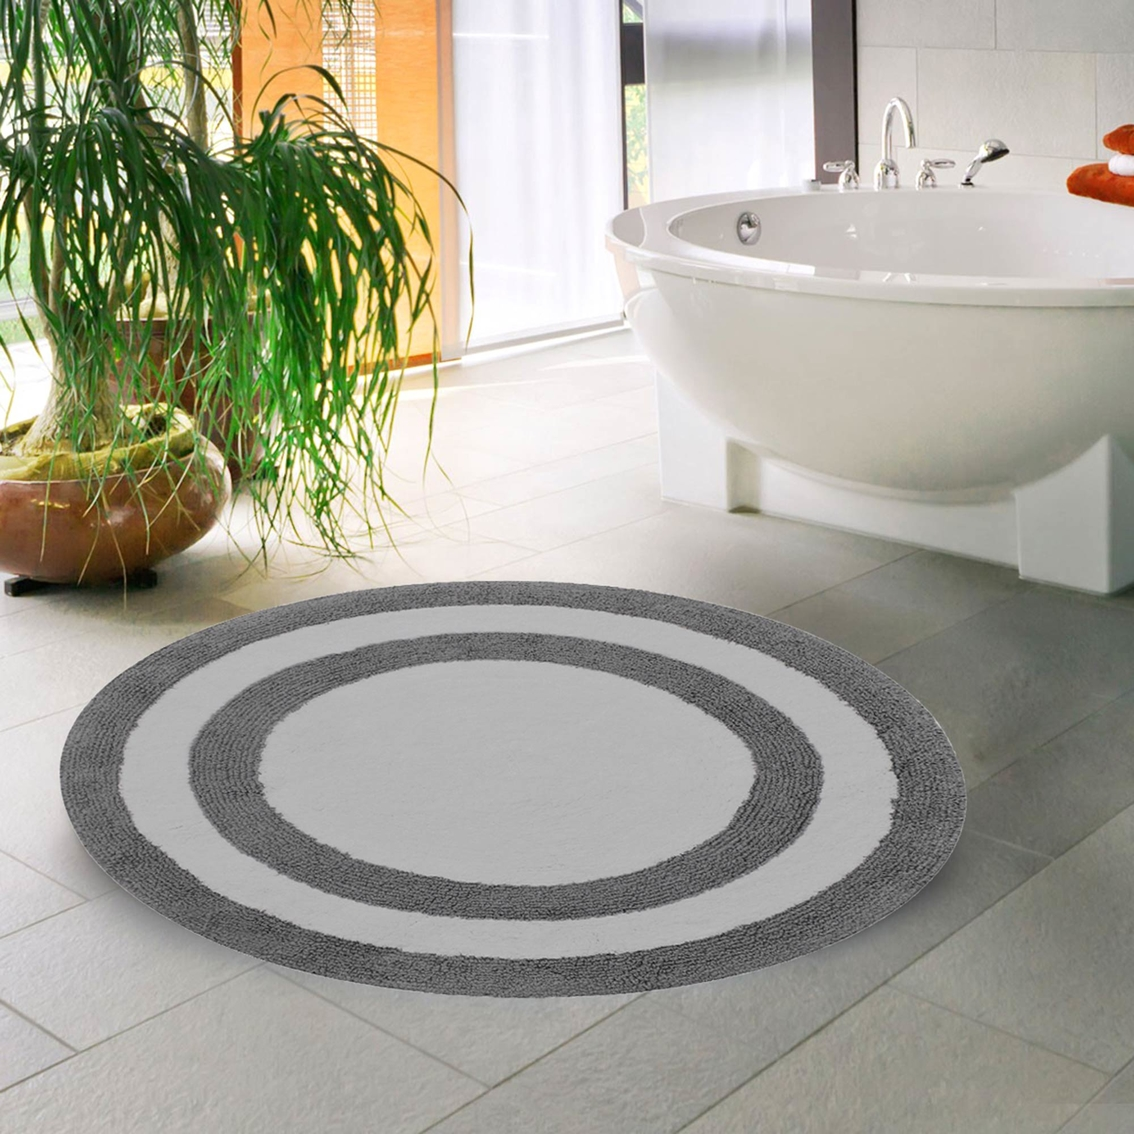 Saffron Fabs 36 In Round Reversible Cotton Bath Rug Bath